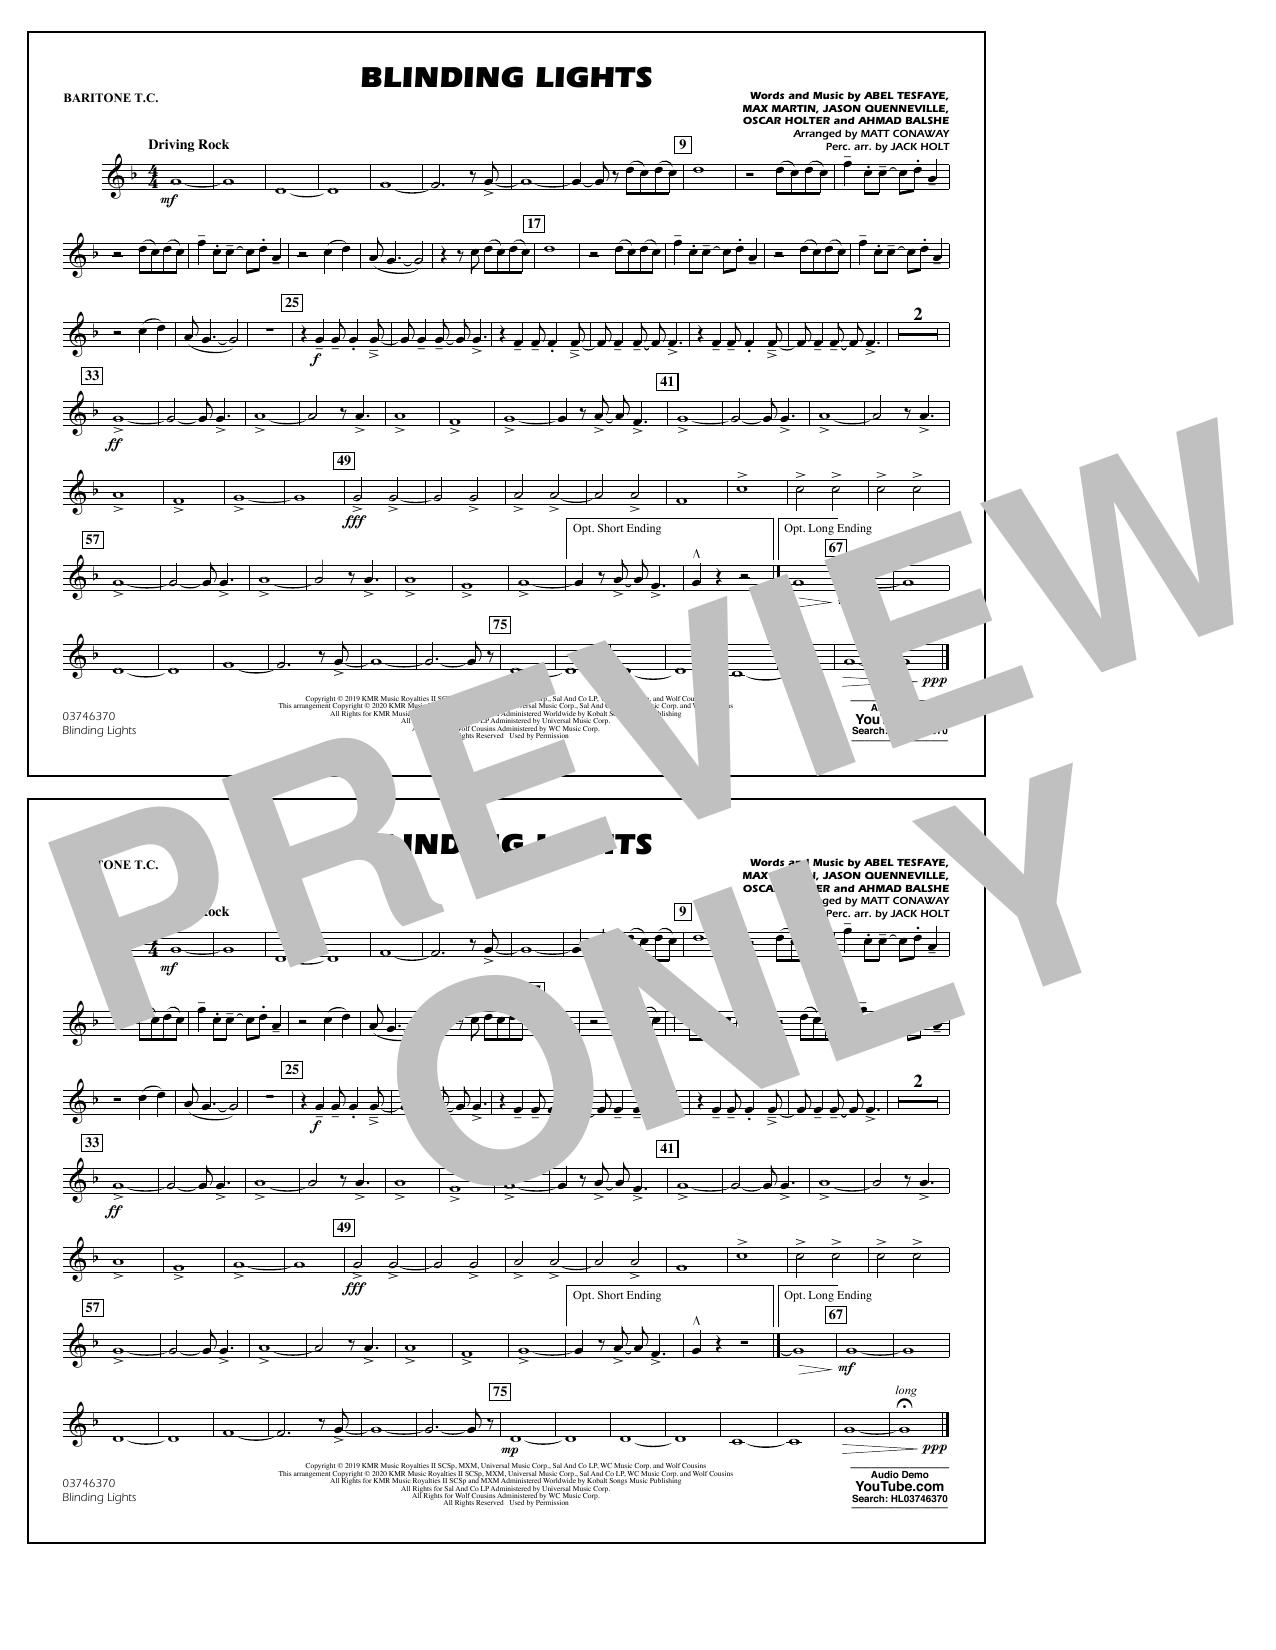 Blinding Lights (arr. Matt Conaway) - Baritone T.C. Sheet Music